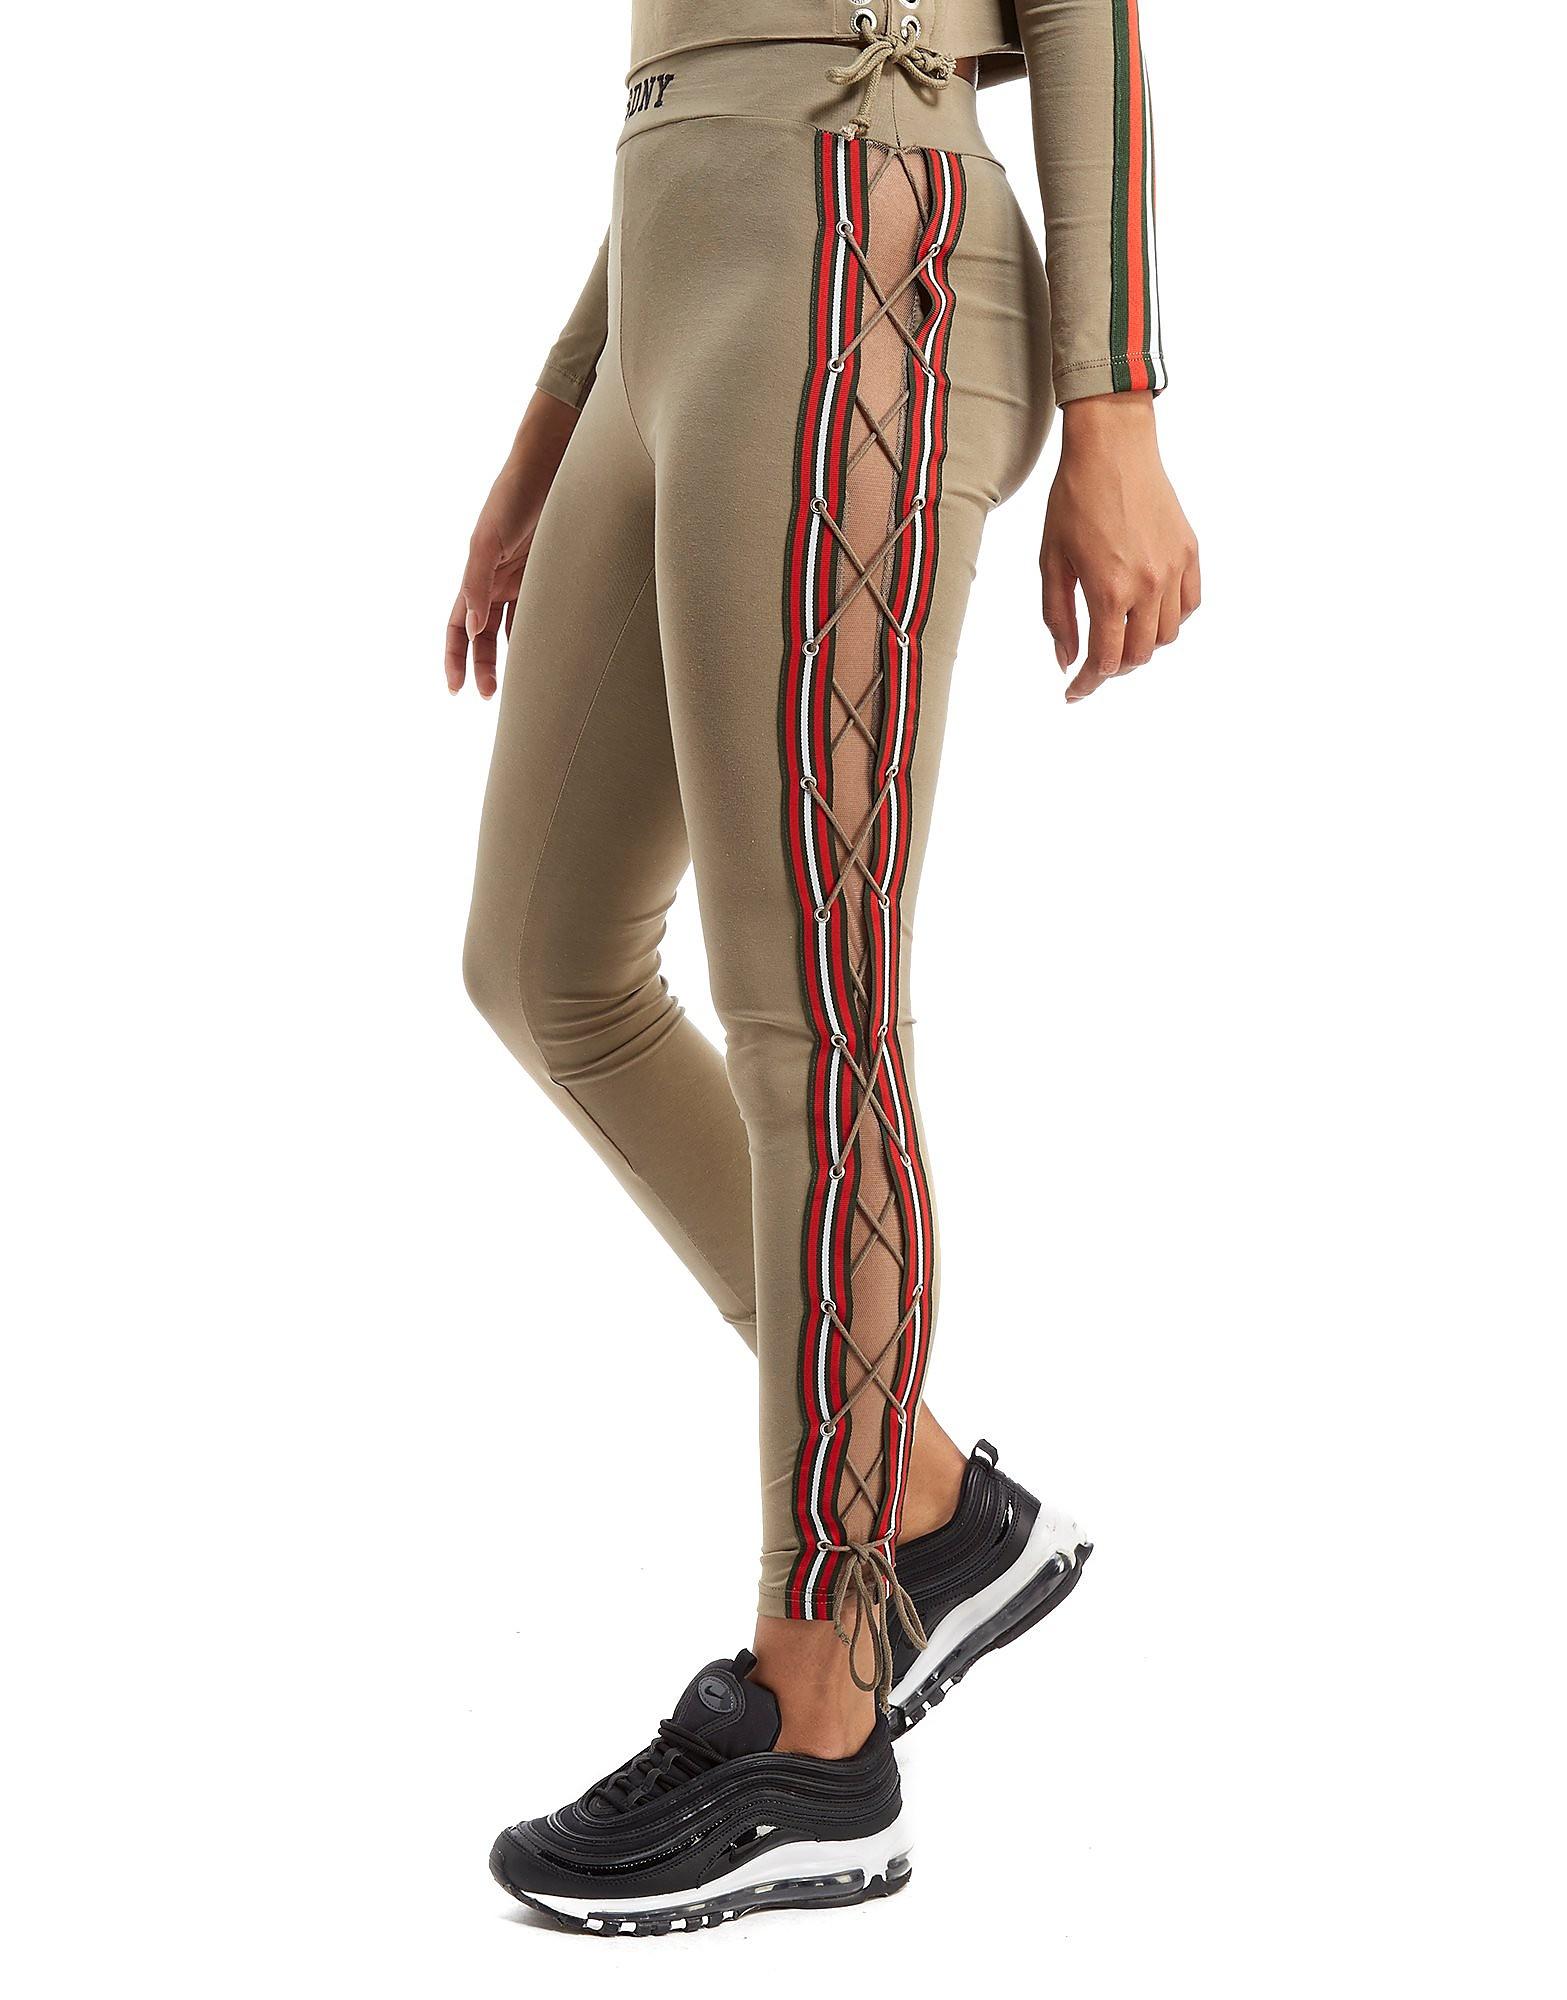 Supply & Demand Lace Tape Leggings